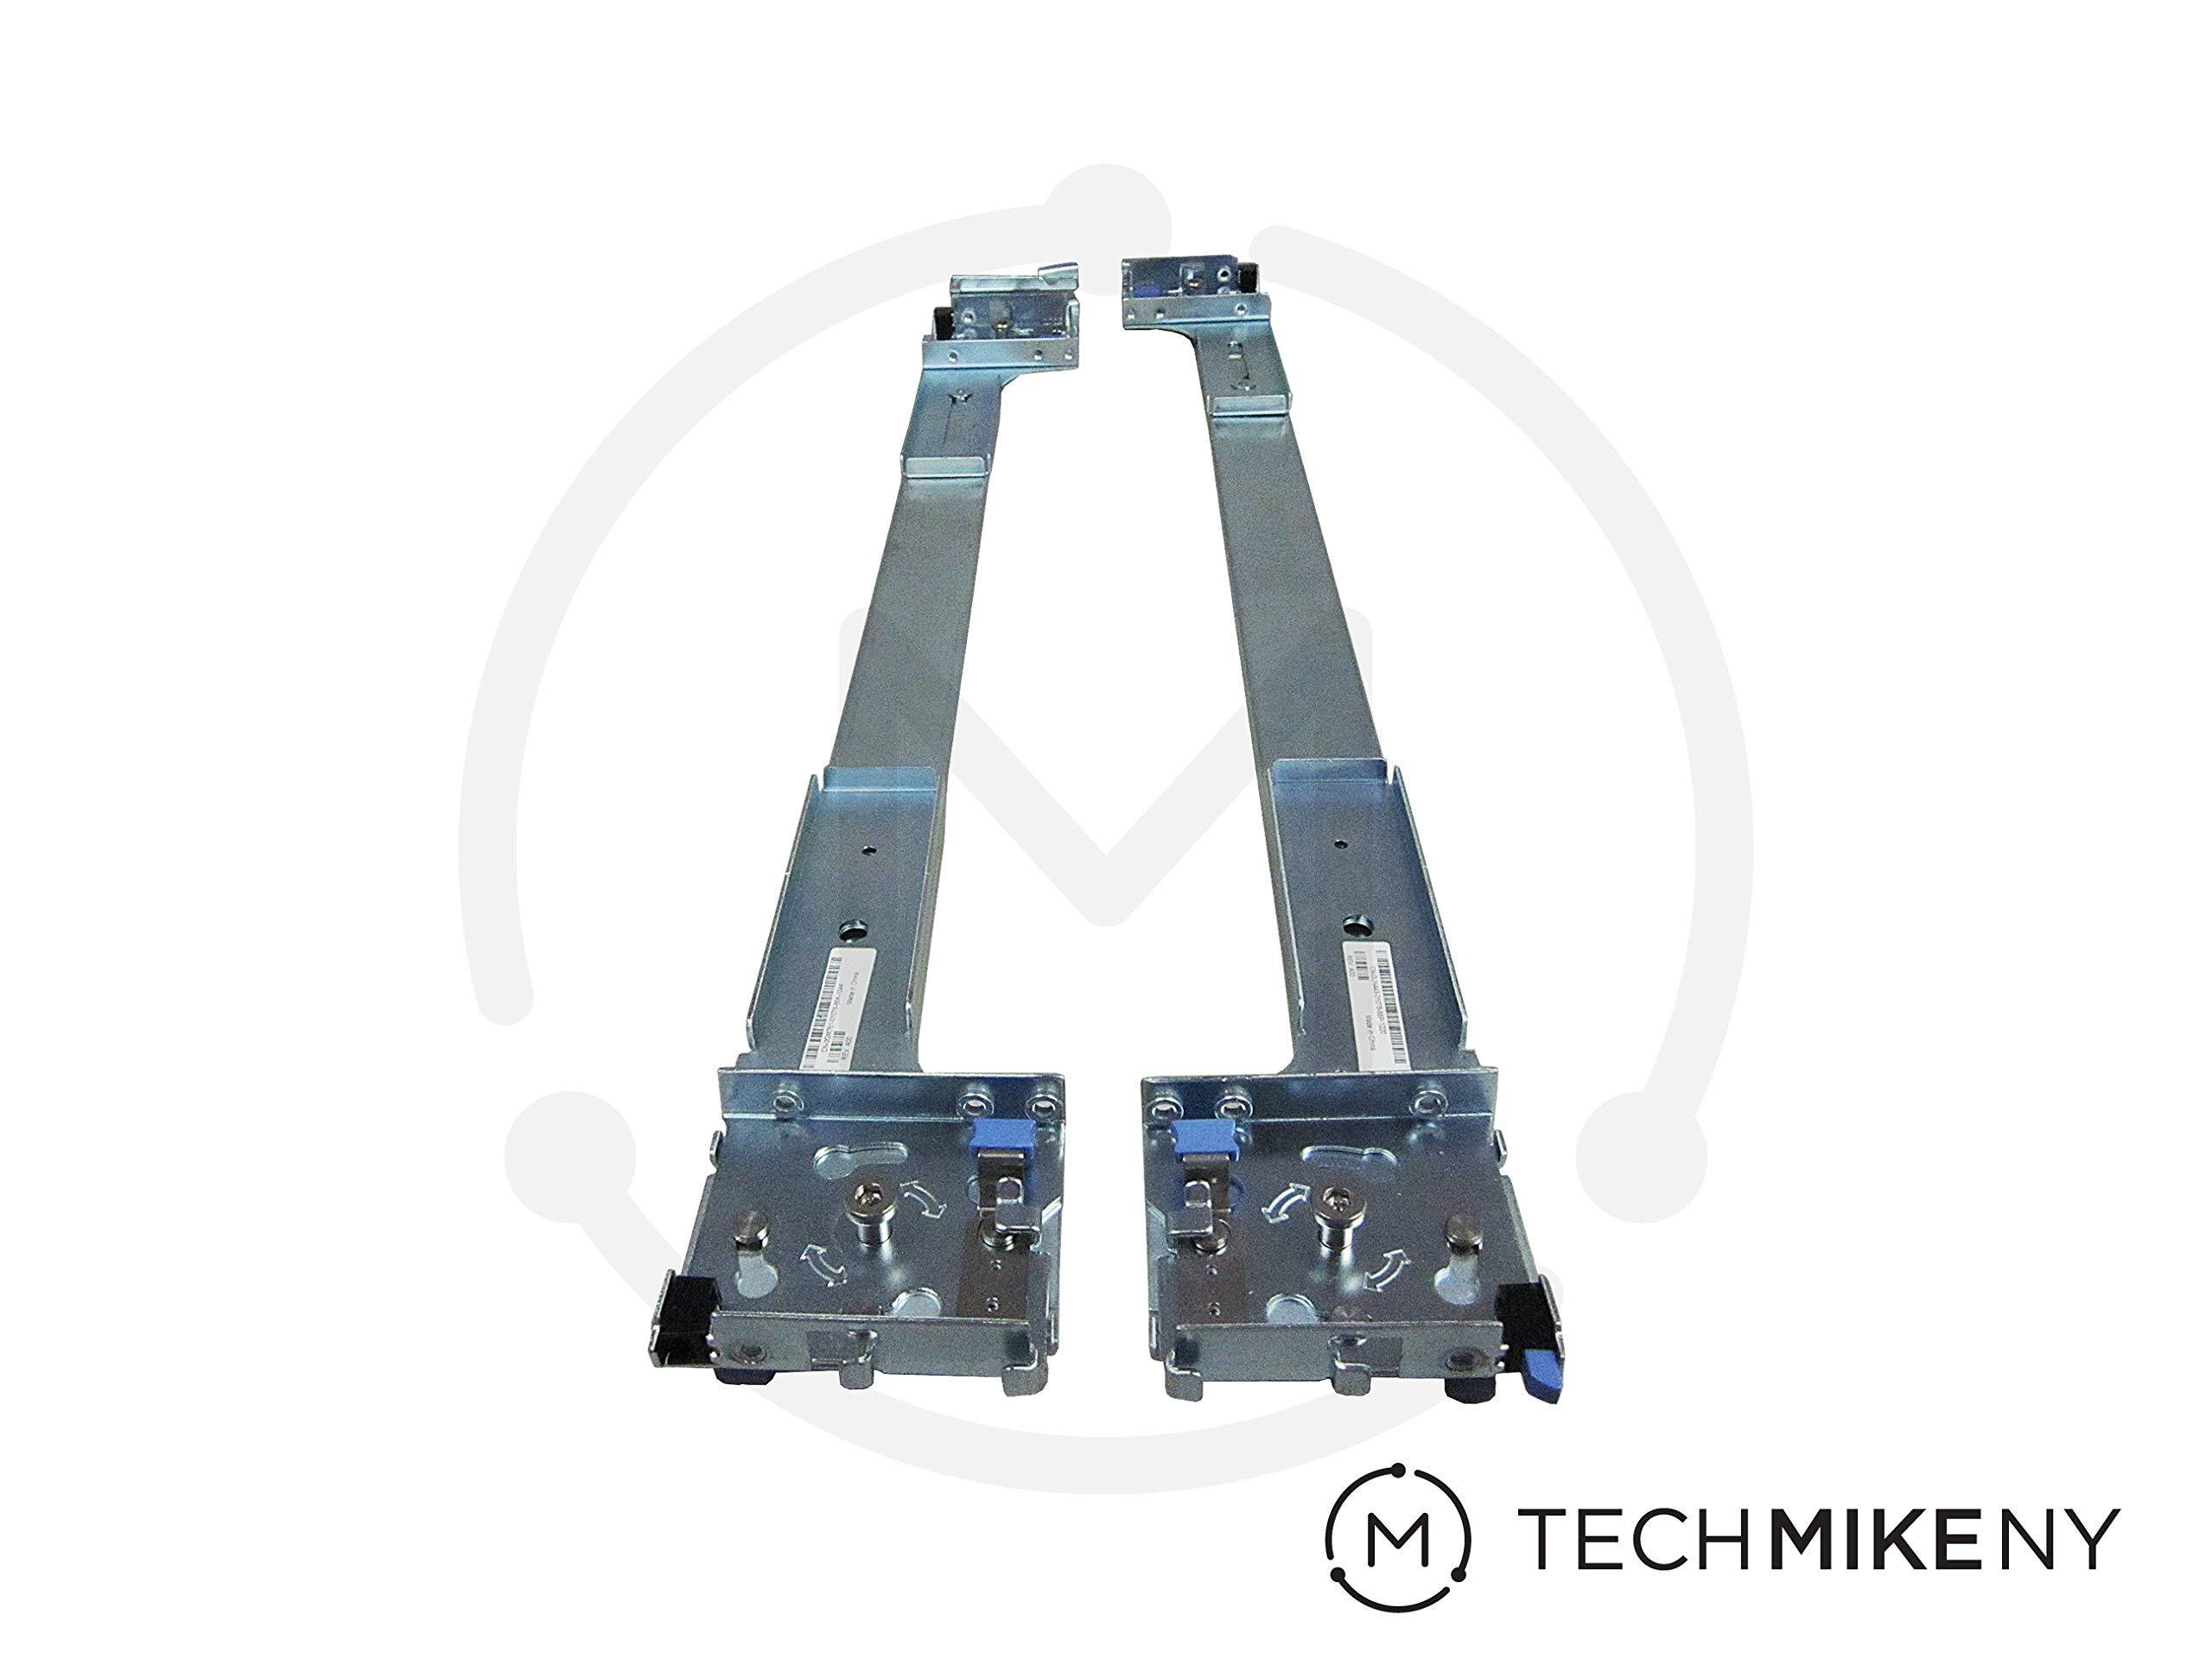 Dell Rapid Rails Kit for Dell PowerEdge 2950 Server (Renewed)